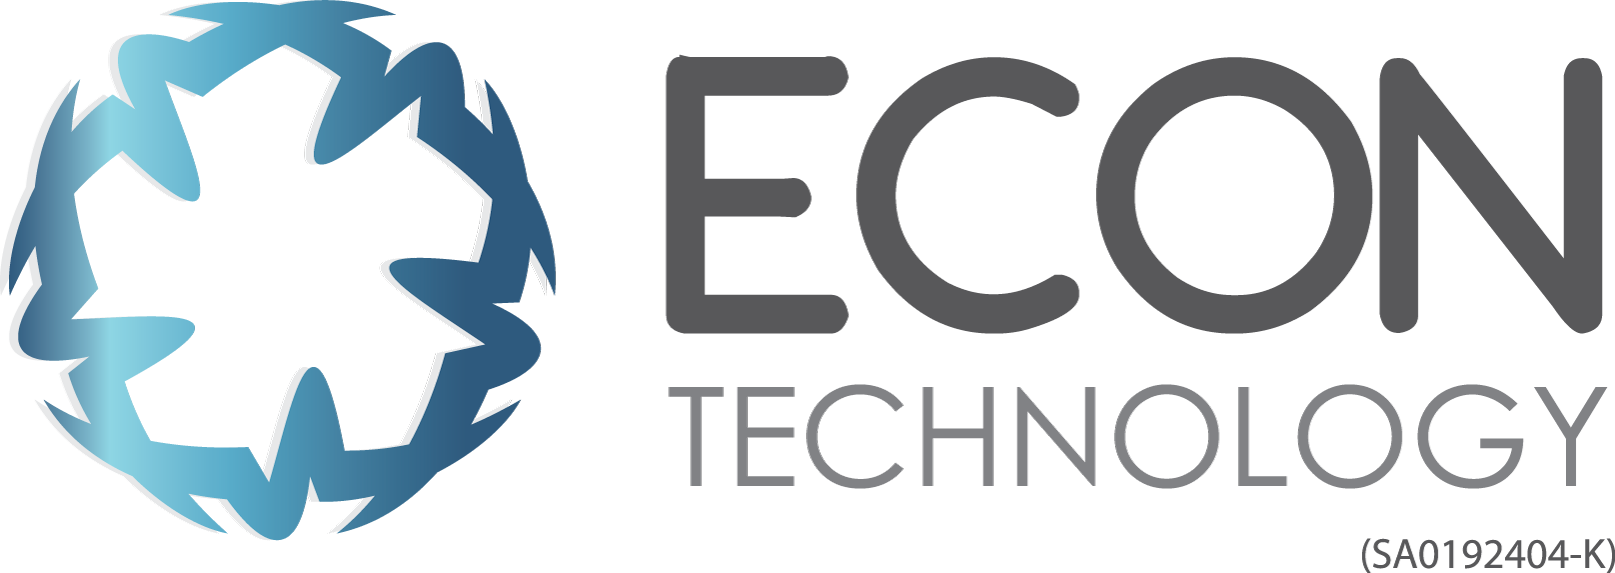 ECON TECHNOLOGY GADGET SDN BHD